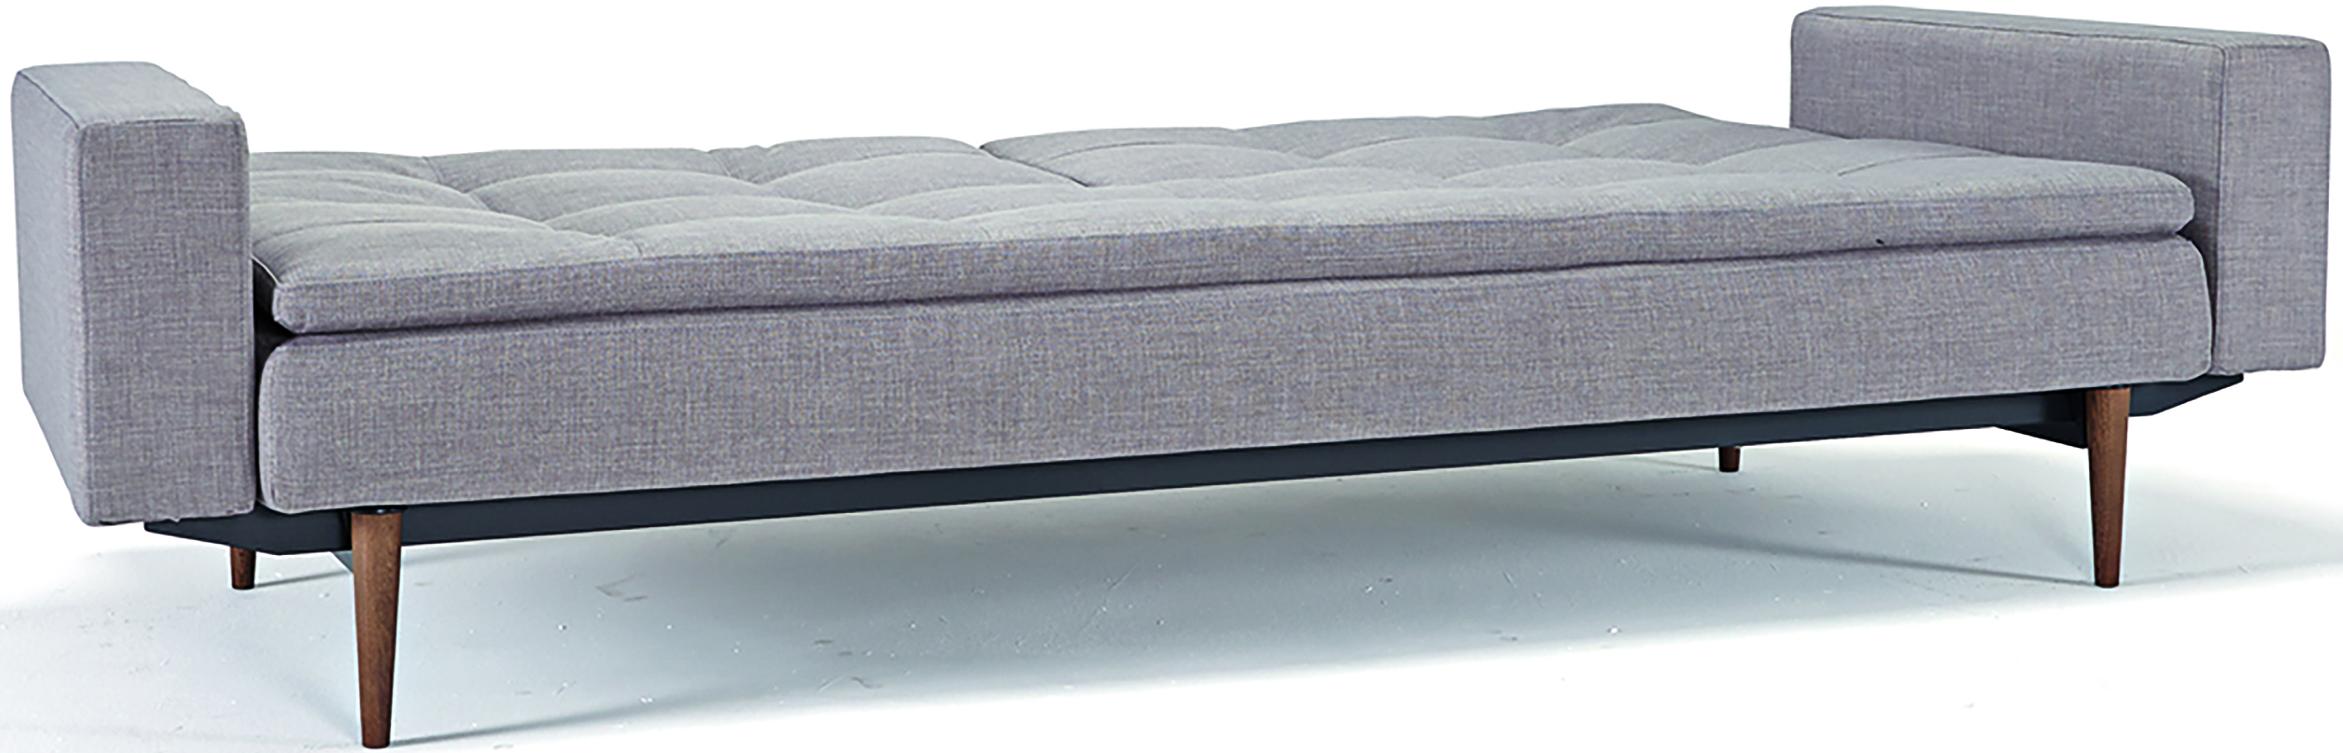 innovation dublexo sofa with arms begum